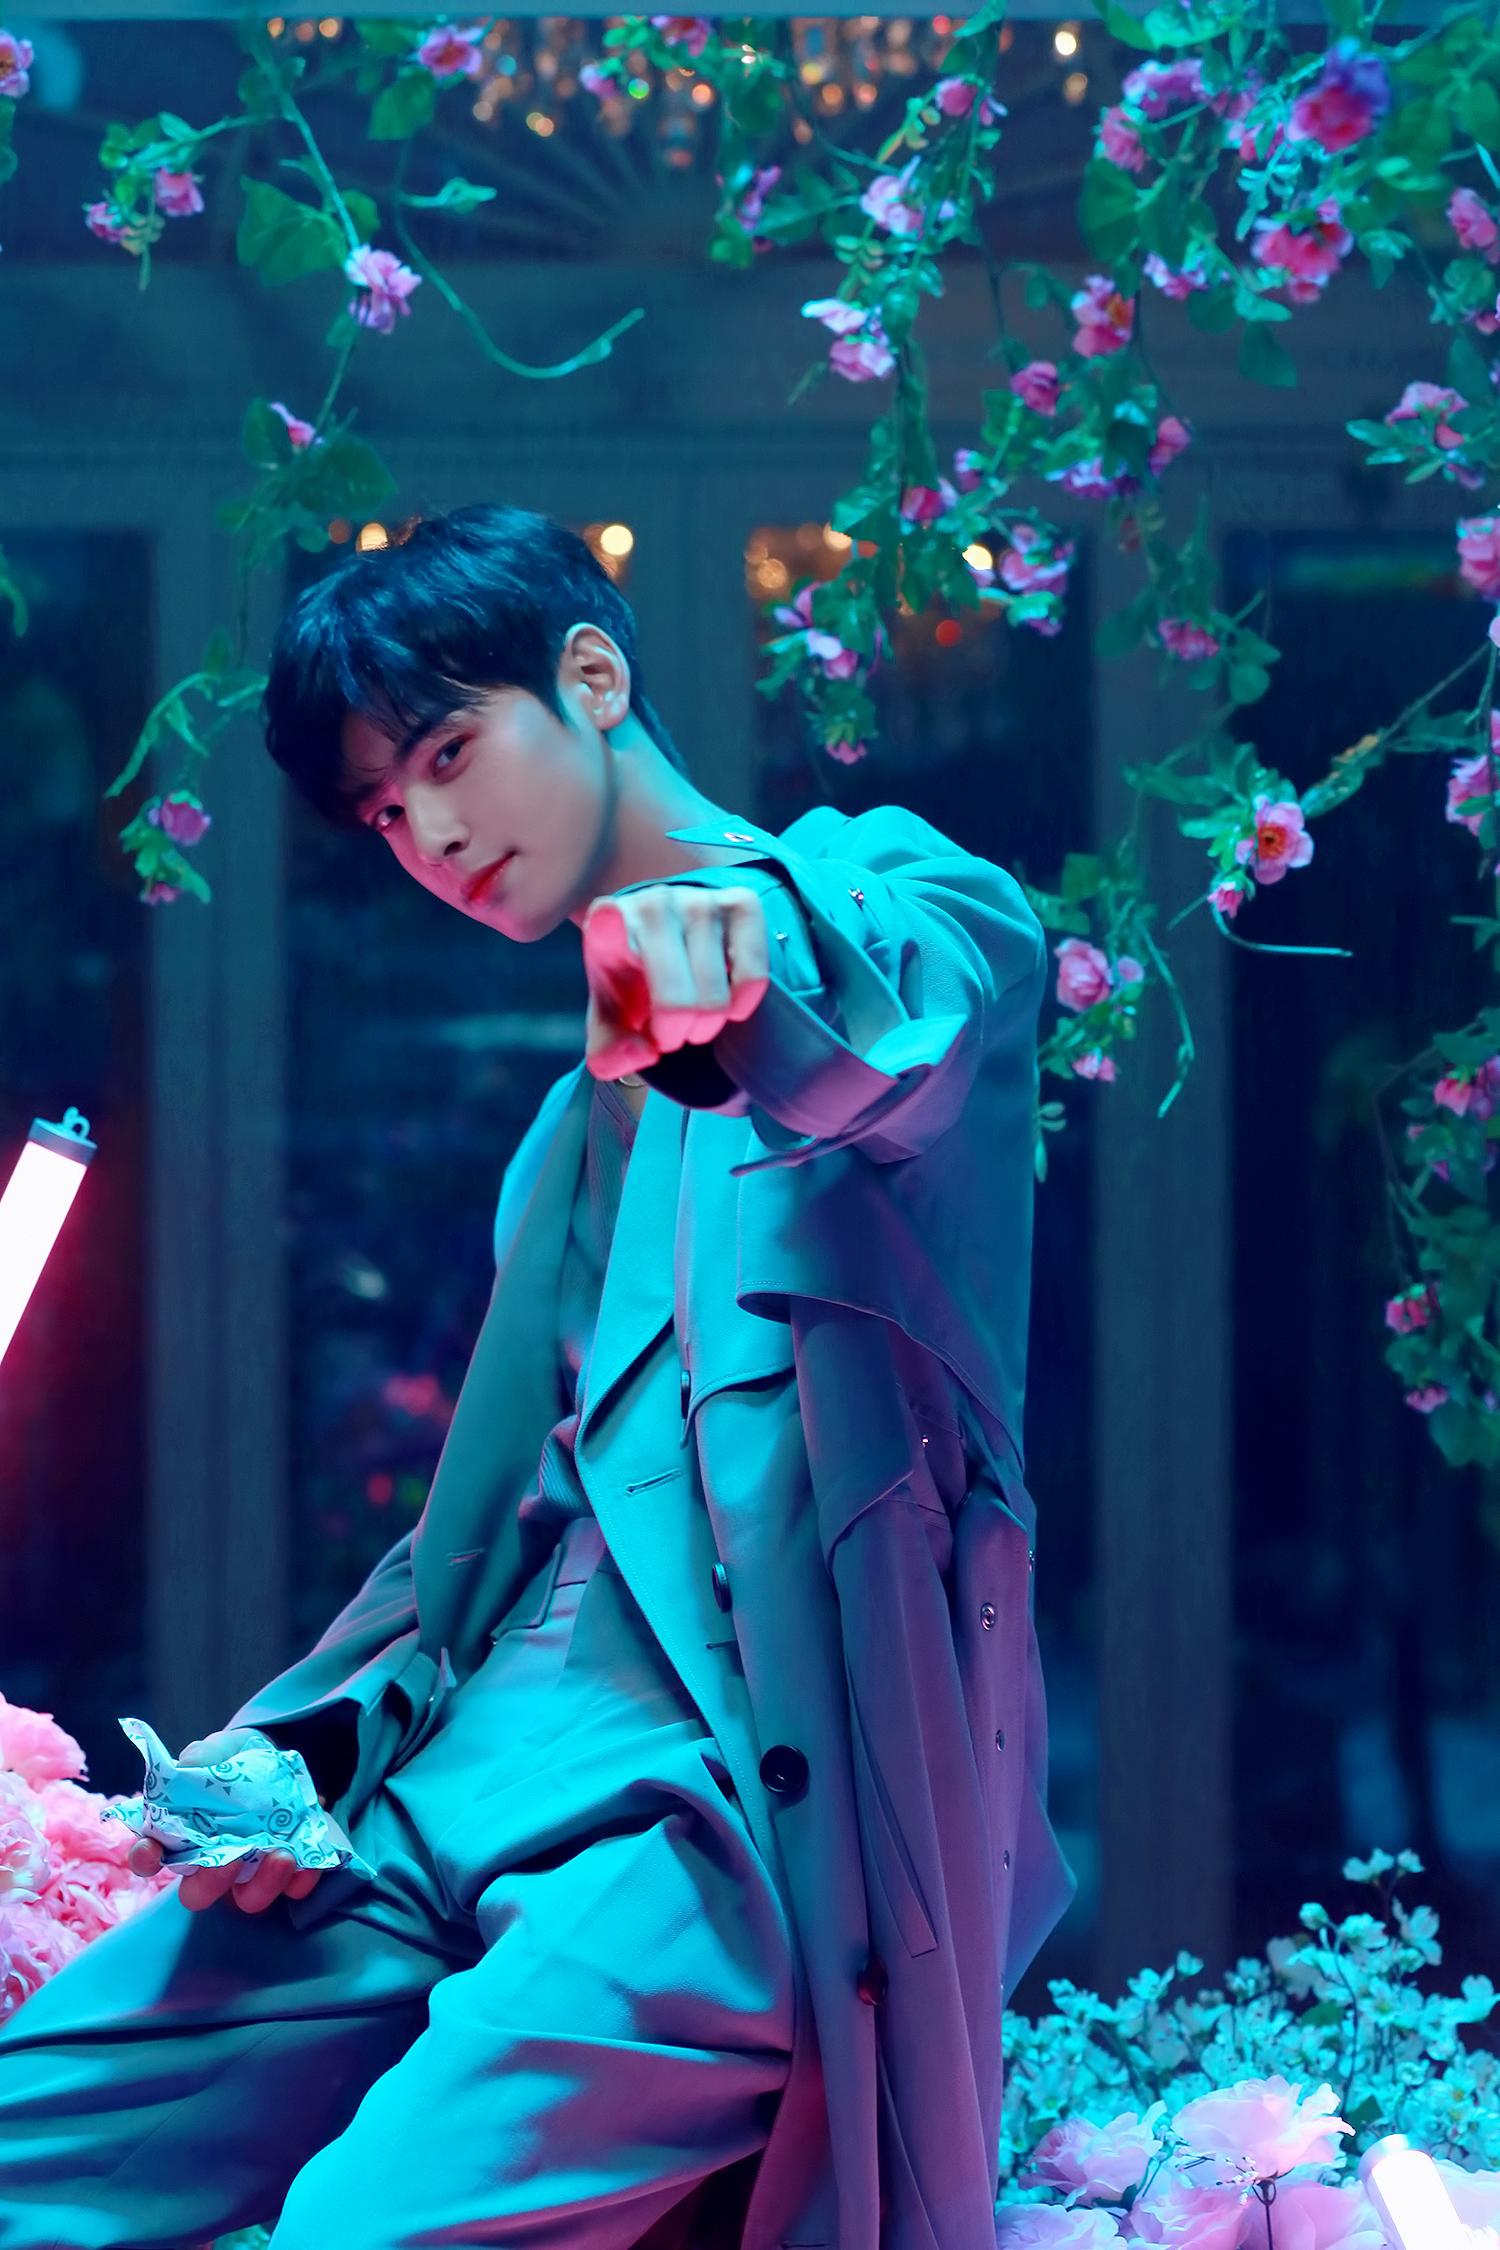 Astro (South Korean band) वॉलपेपर titled 'All Night' MV behind - Eunwoo. '